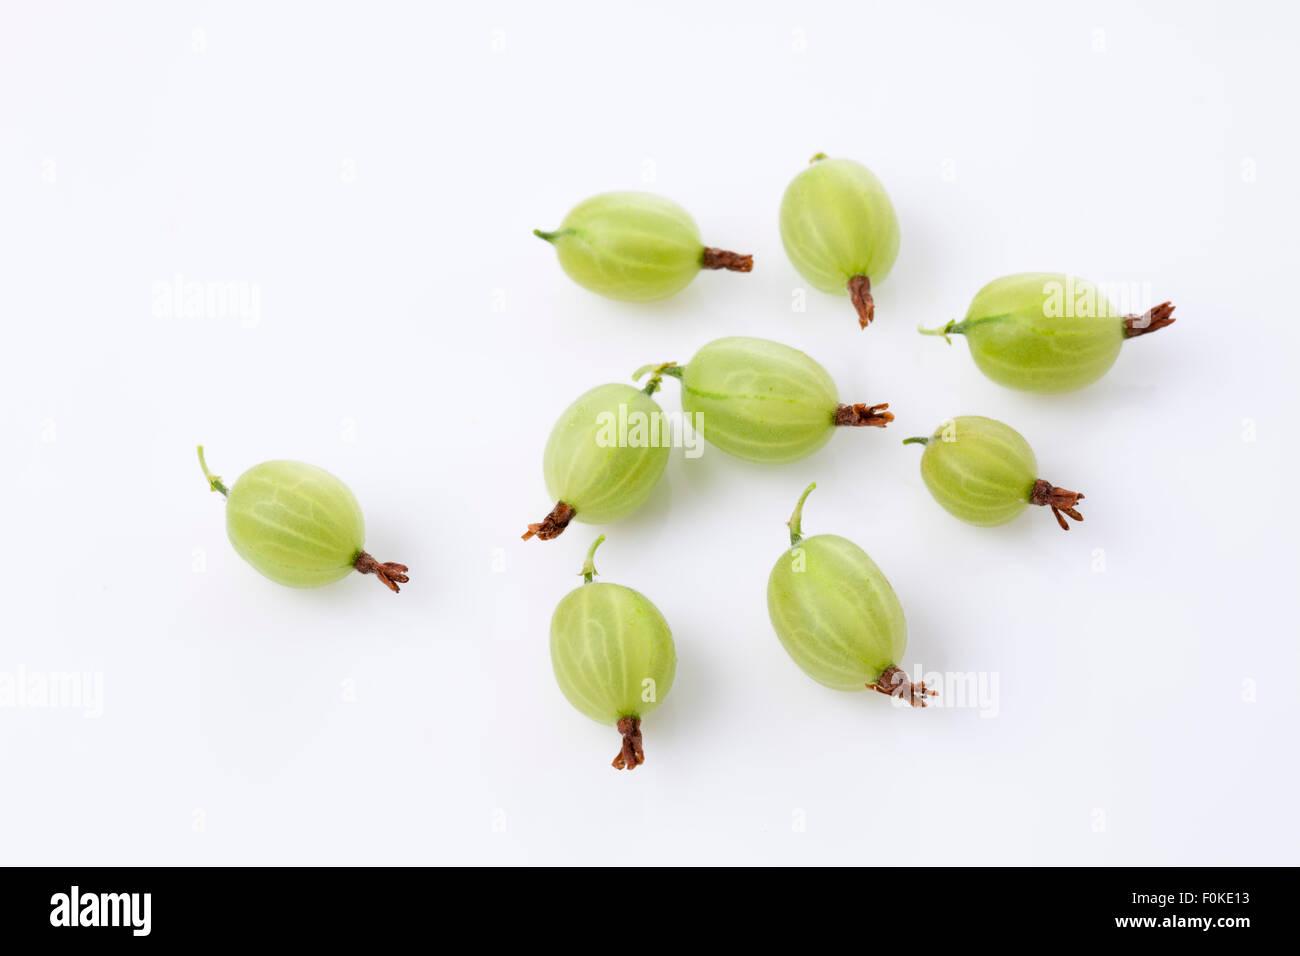 Gooseberries, Ribes uva-crispa - Stock Image